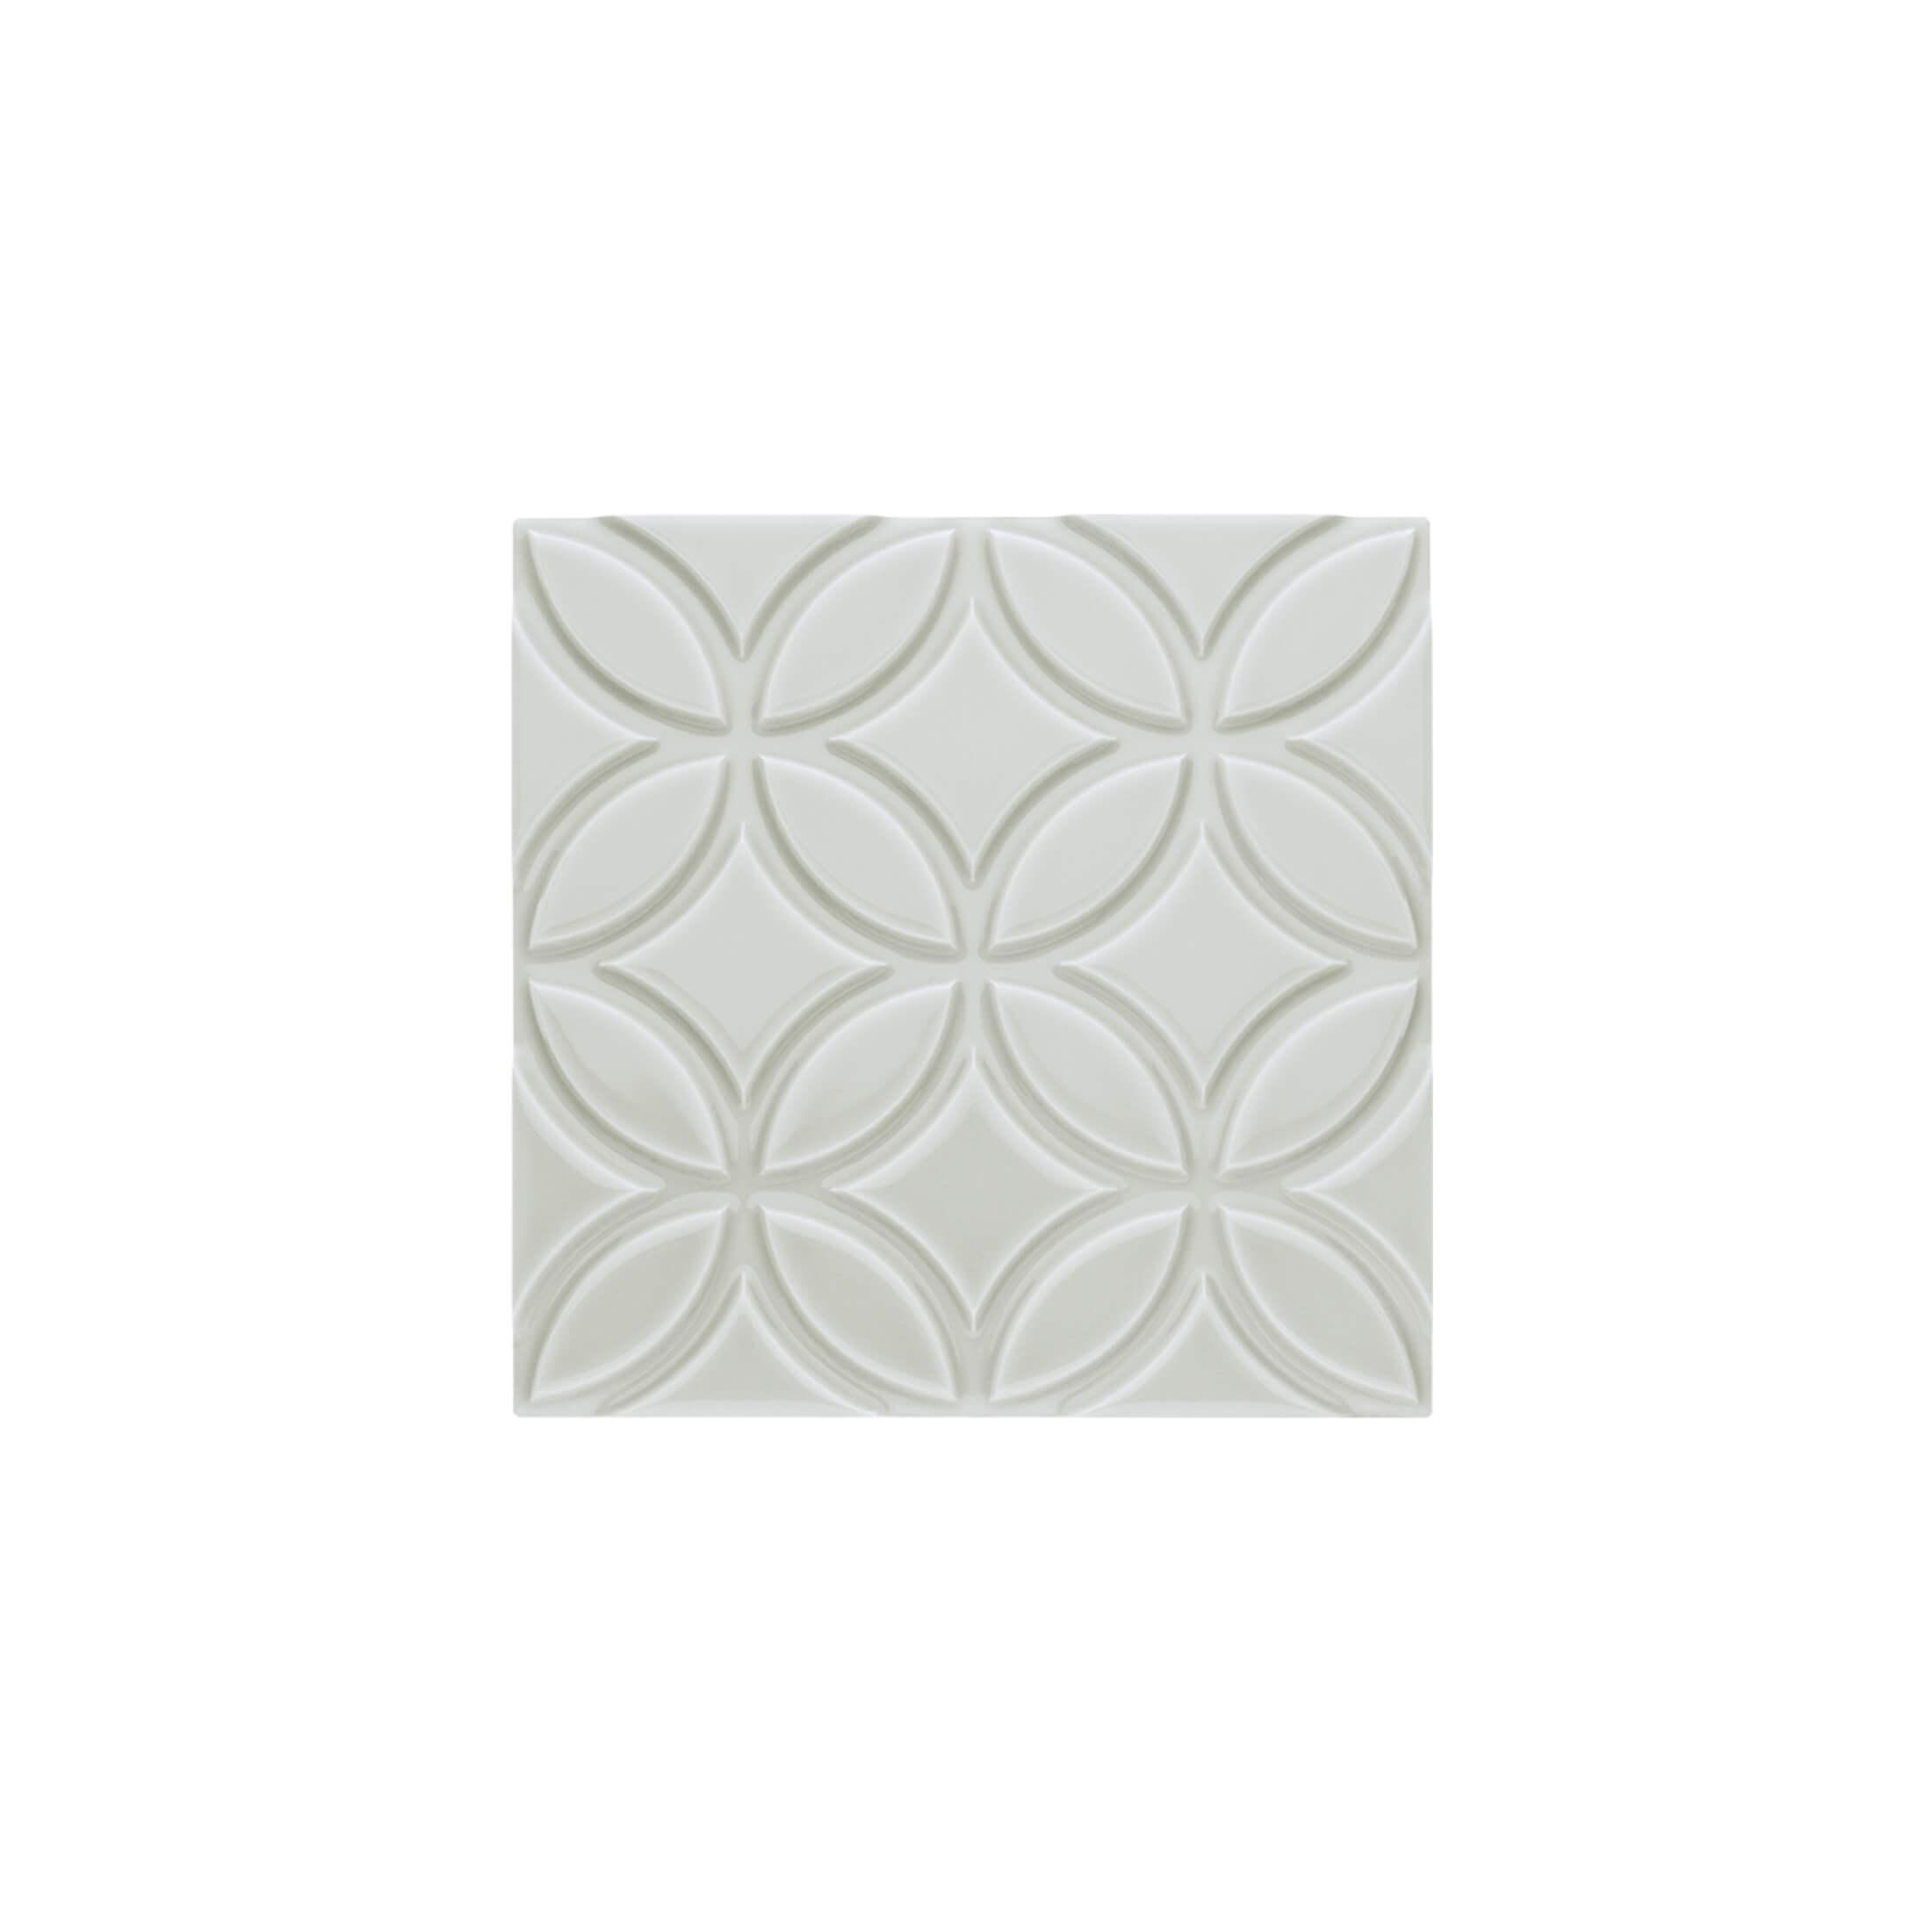 ADNE4136 - LISO BOTANICAL - 15 cm X 15 cm